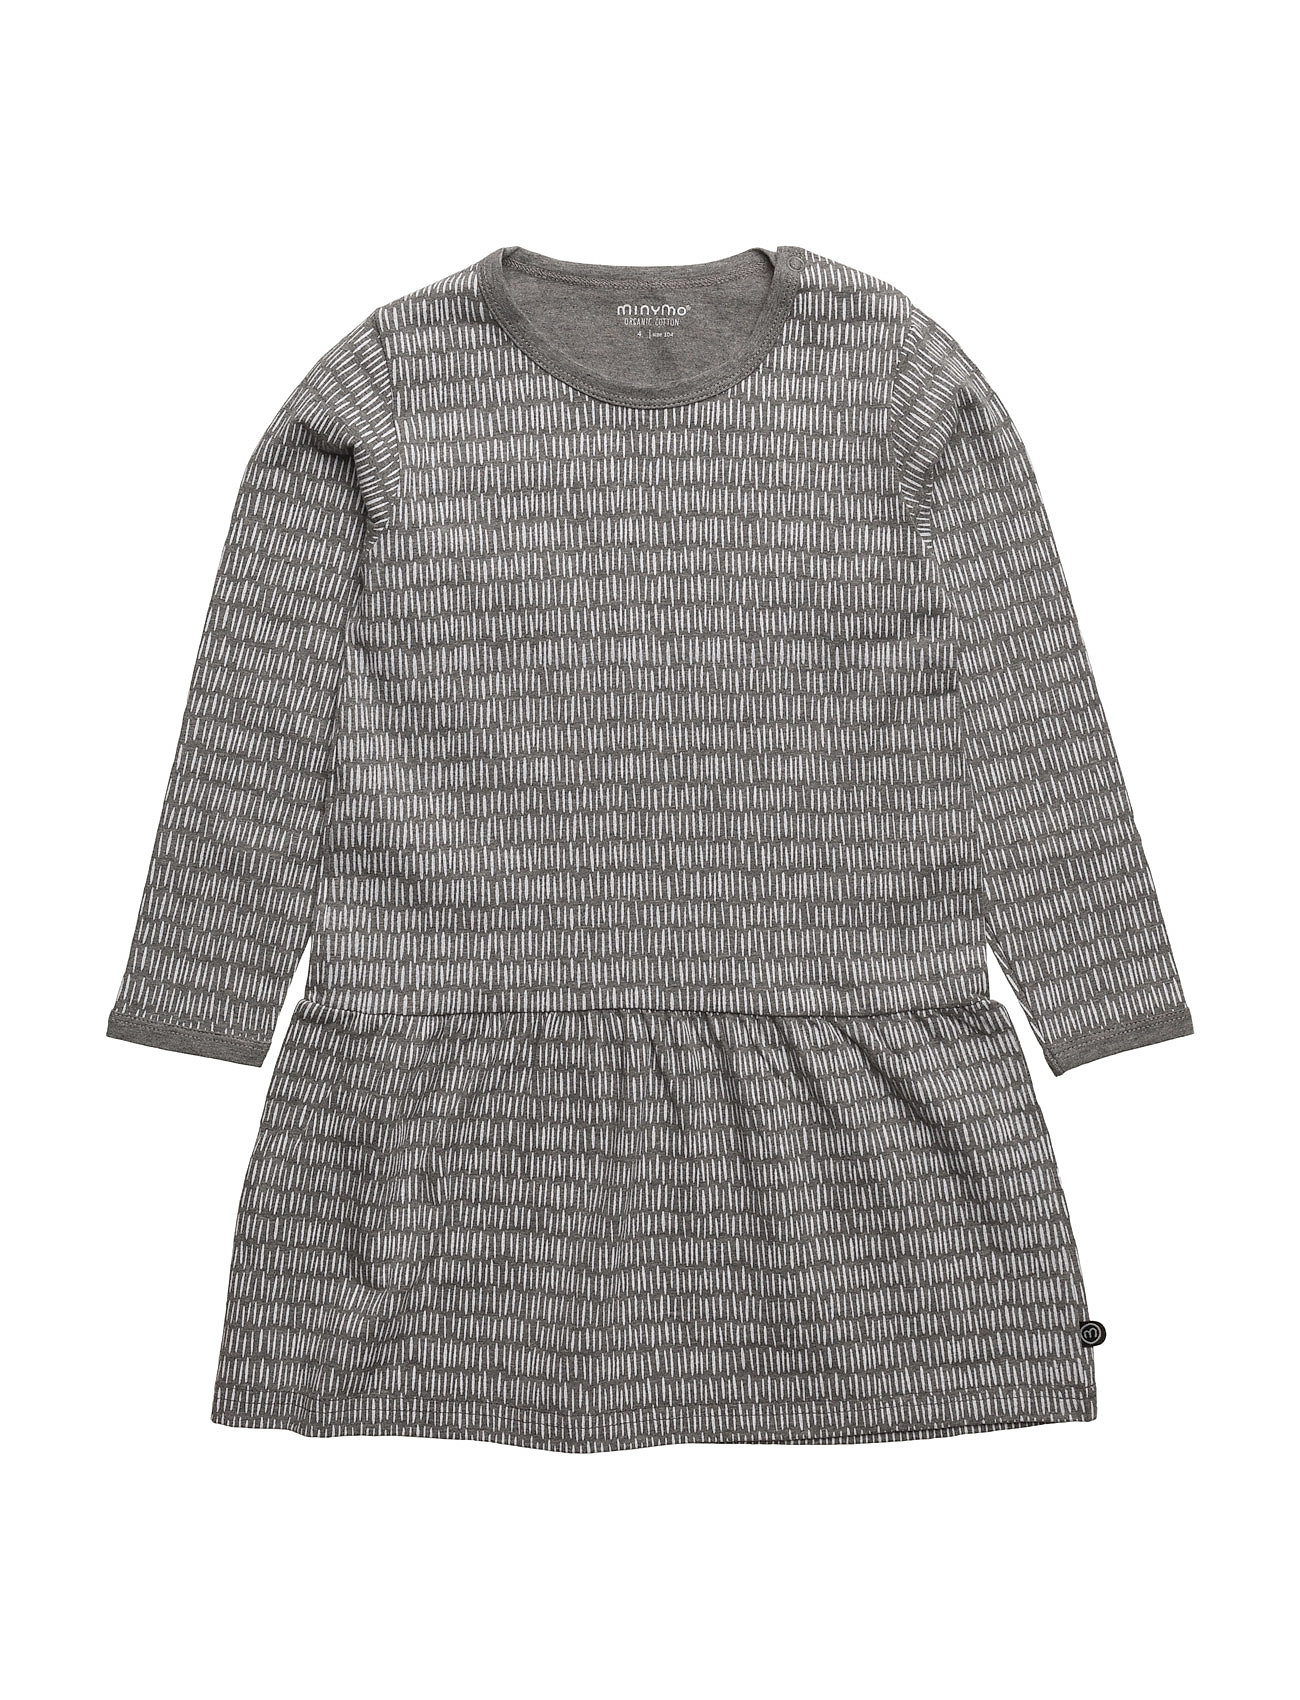 Image of 03 - Dress Ls (2661363887)